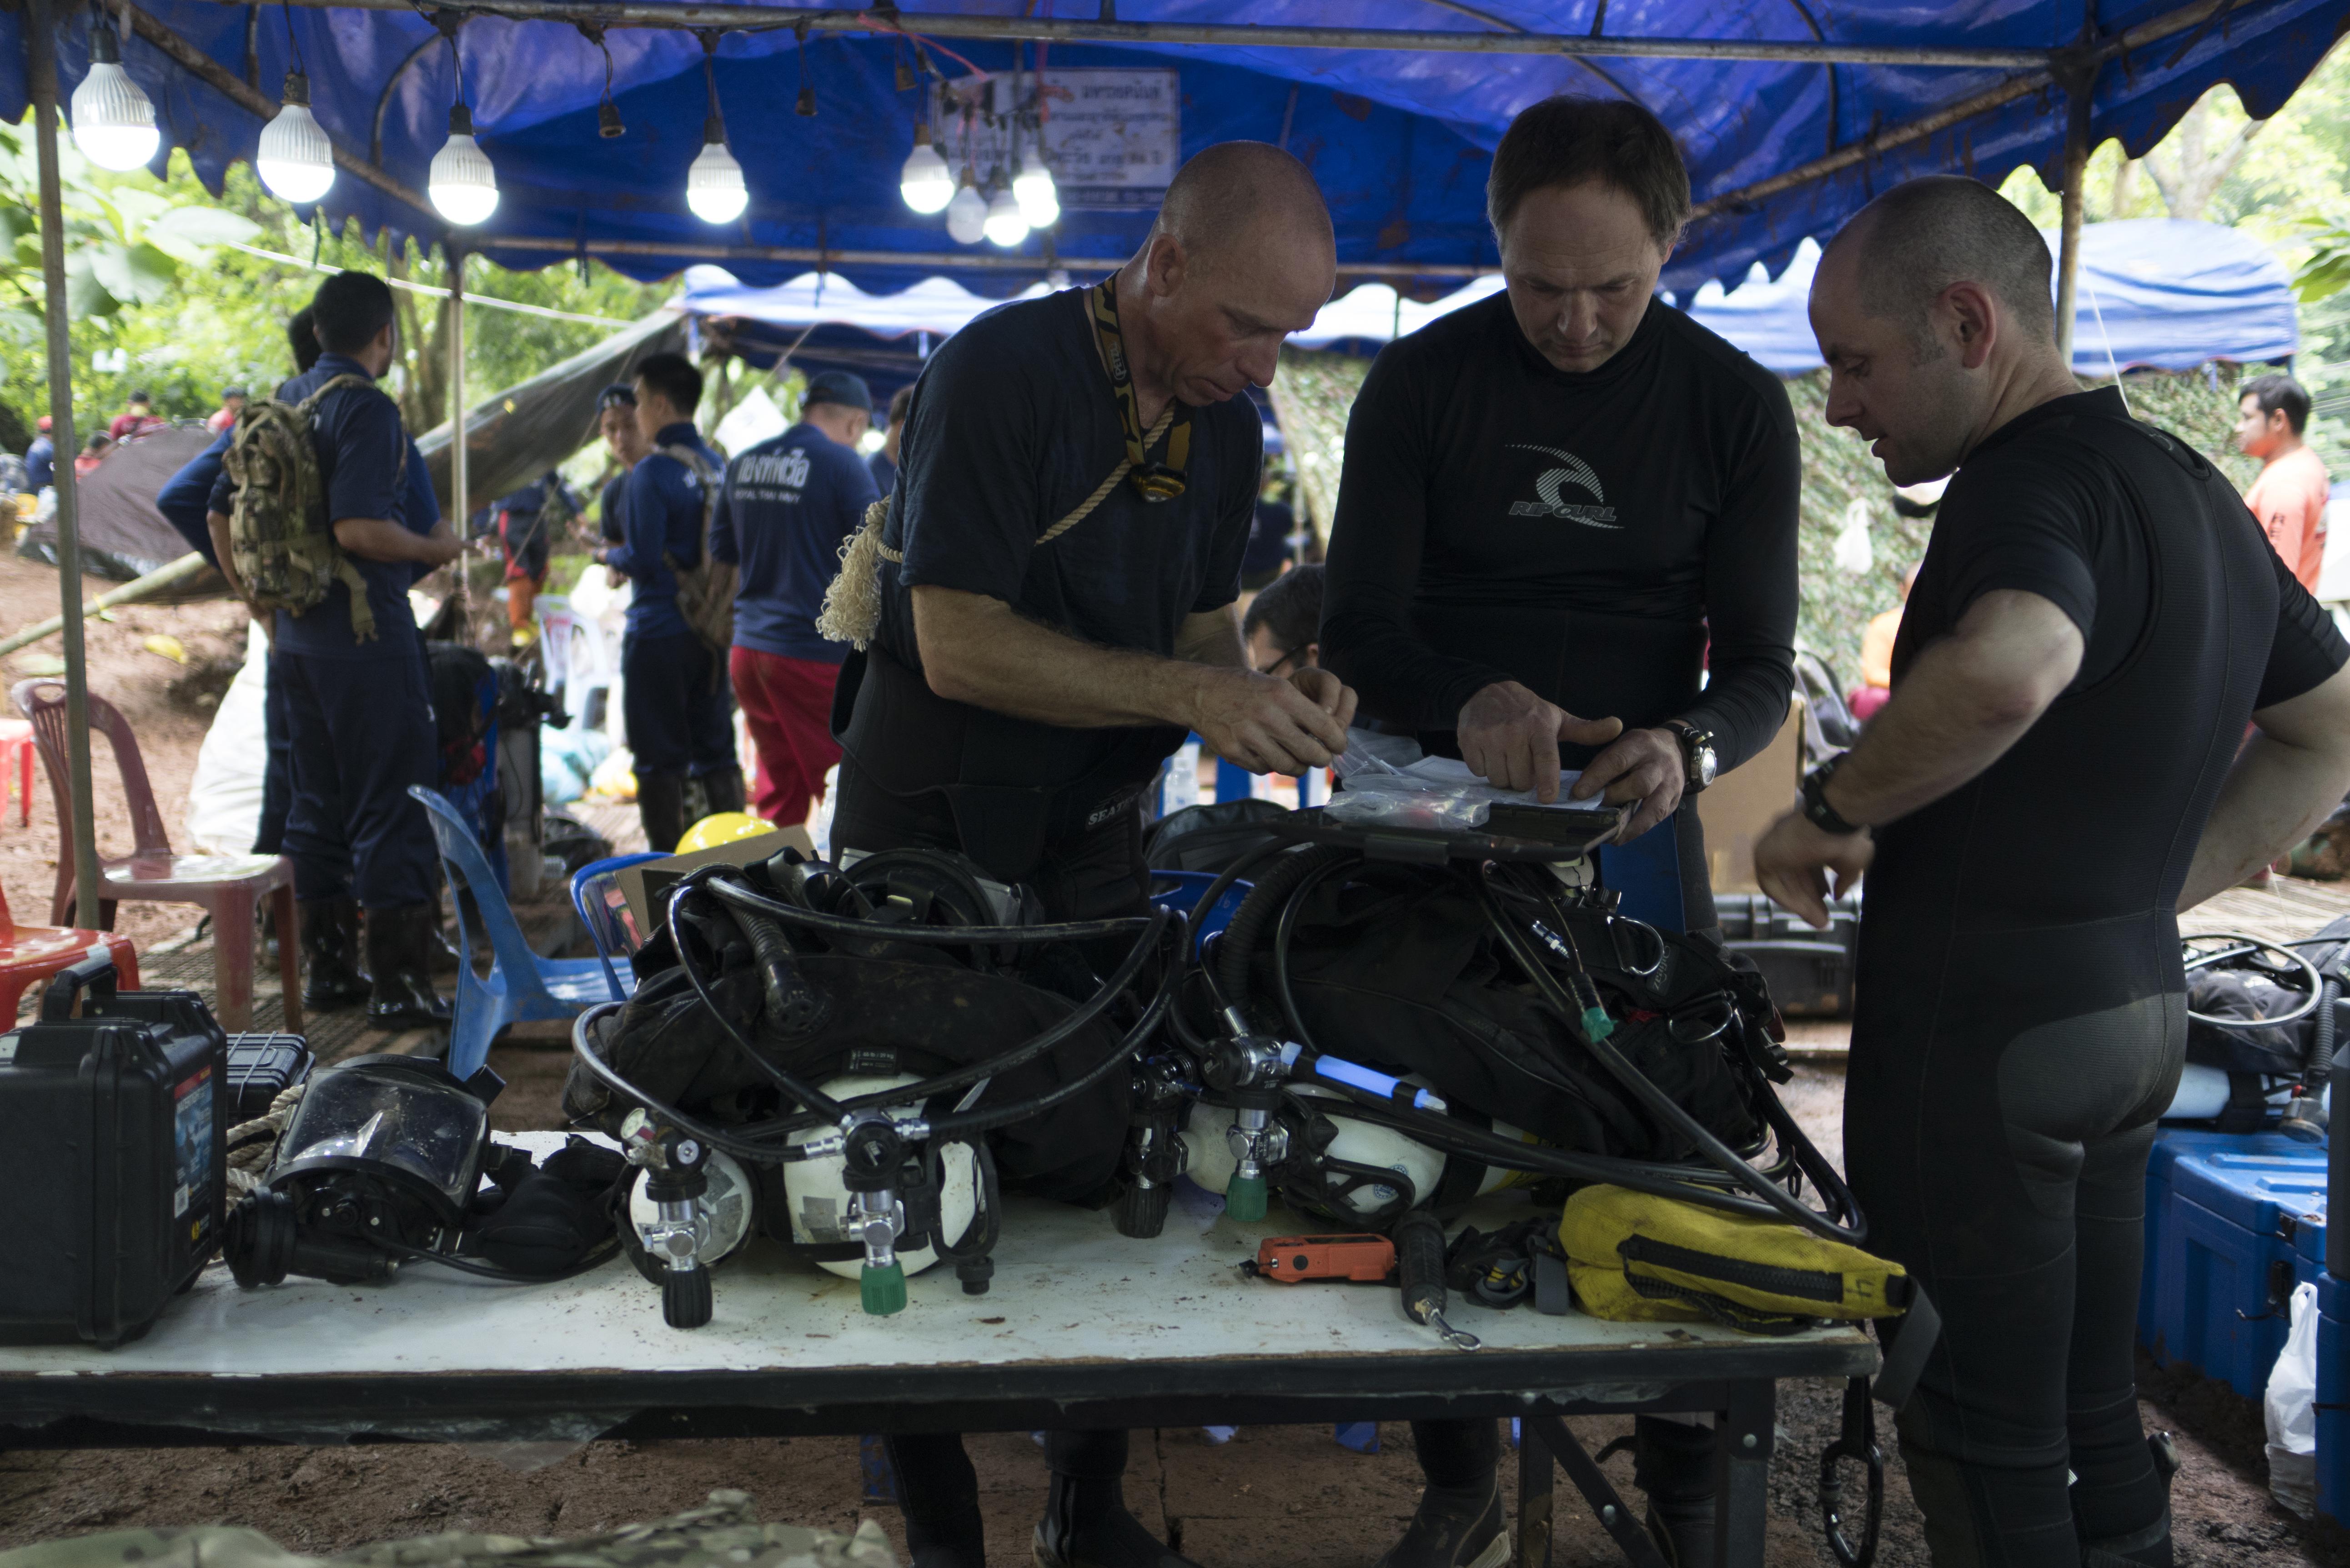 Plik:4547292 Cave rescue divers prepare dive equipment at